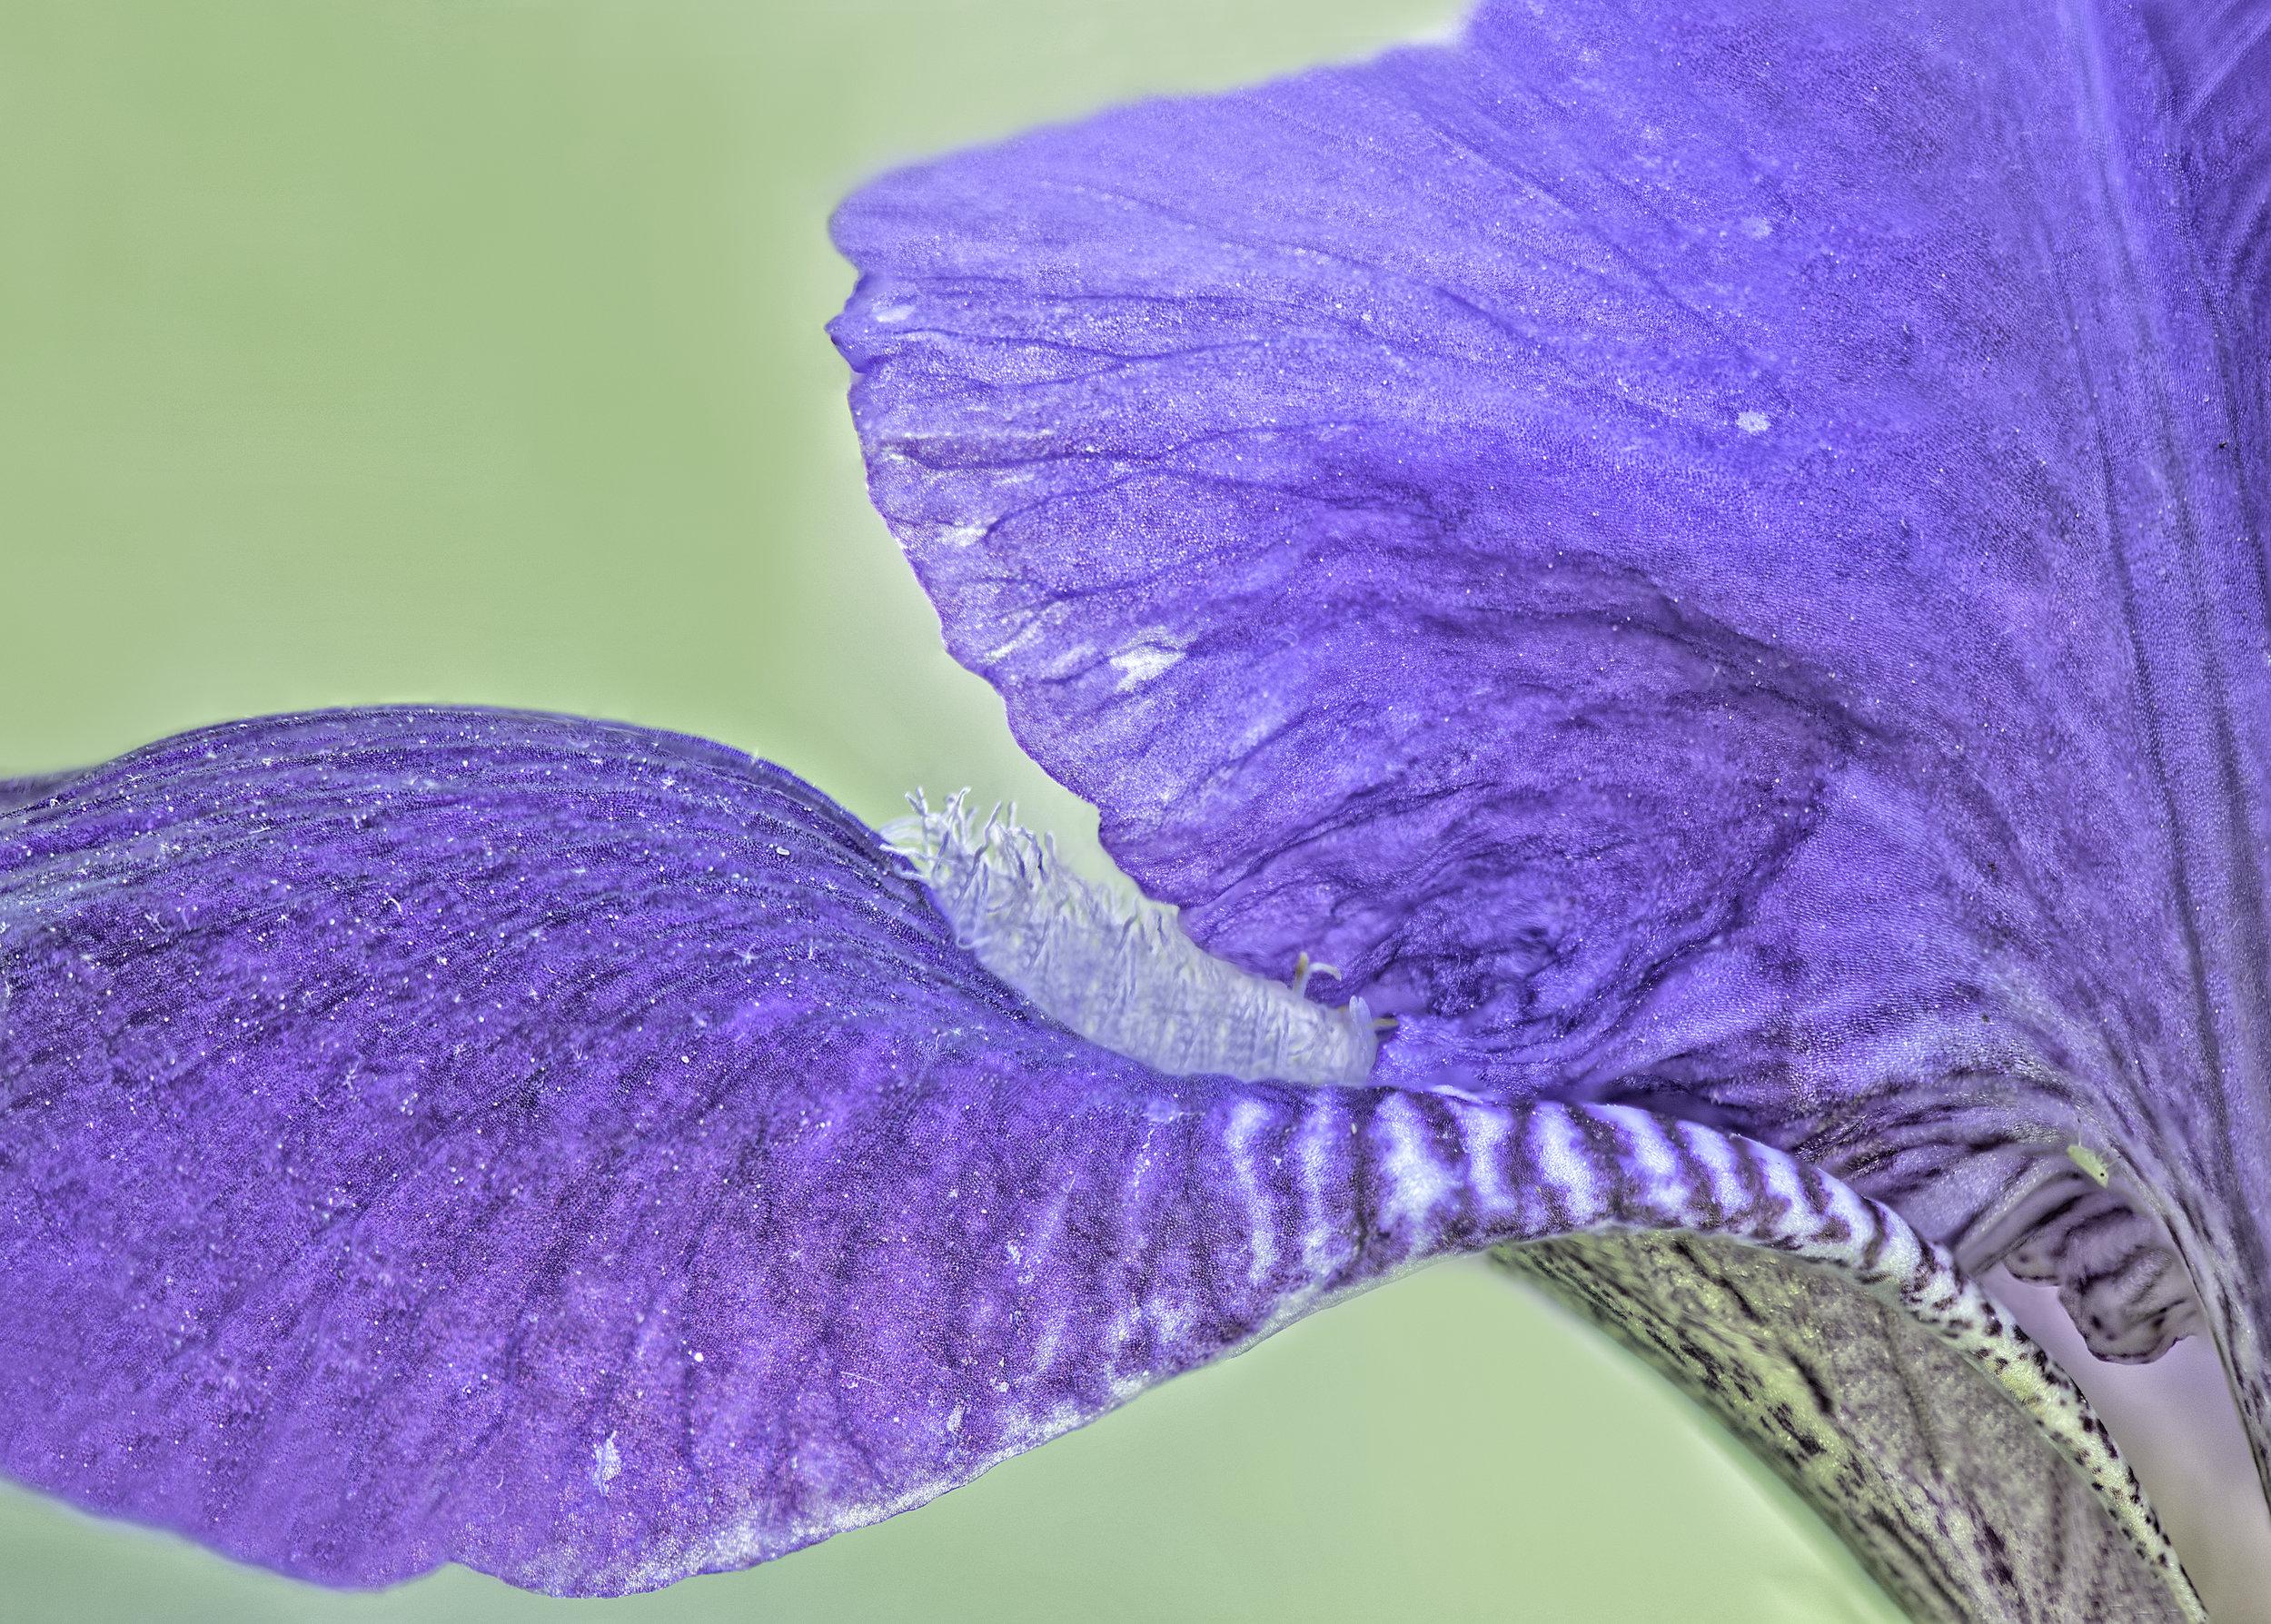 Lensbaby Velvet 85, f1.8 10-image soft-focus focus stack